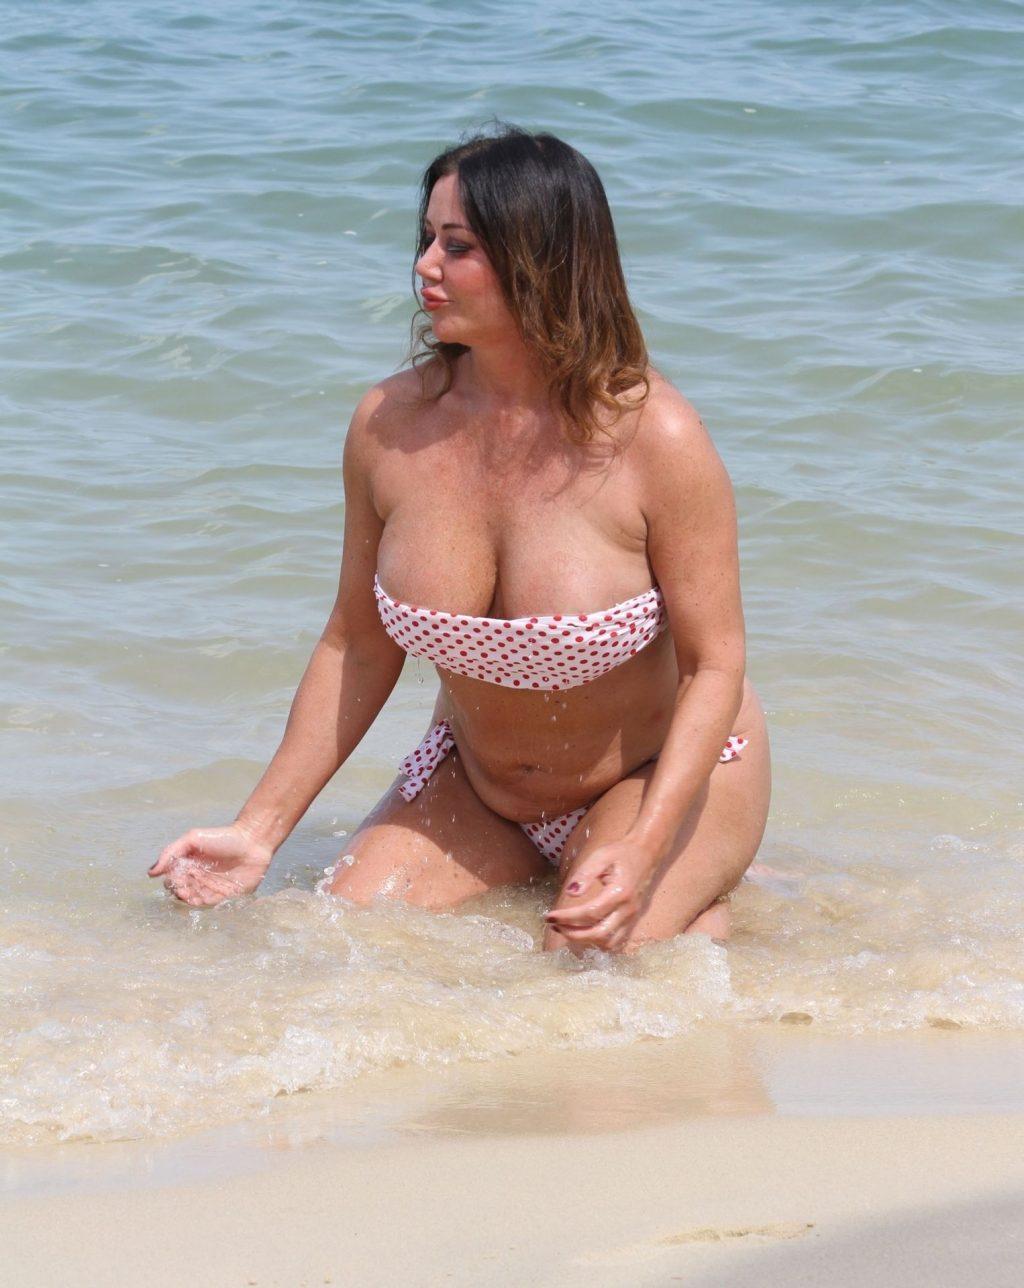 Lisa Appleton Hot & Topless (42 Photos)